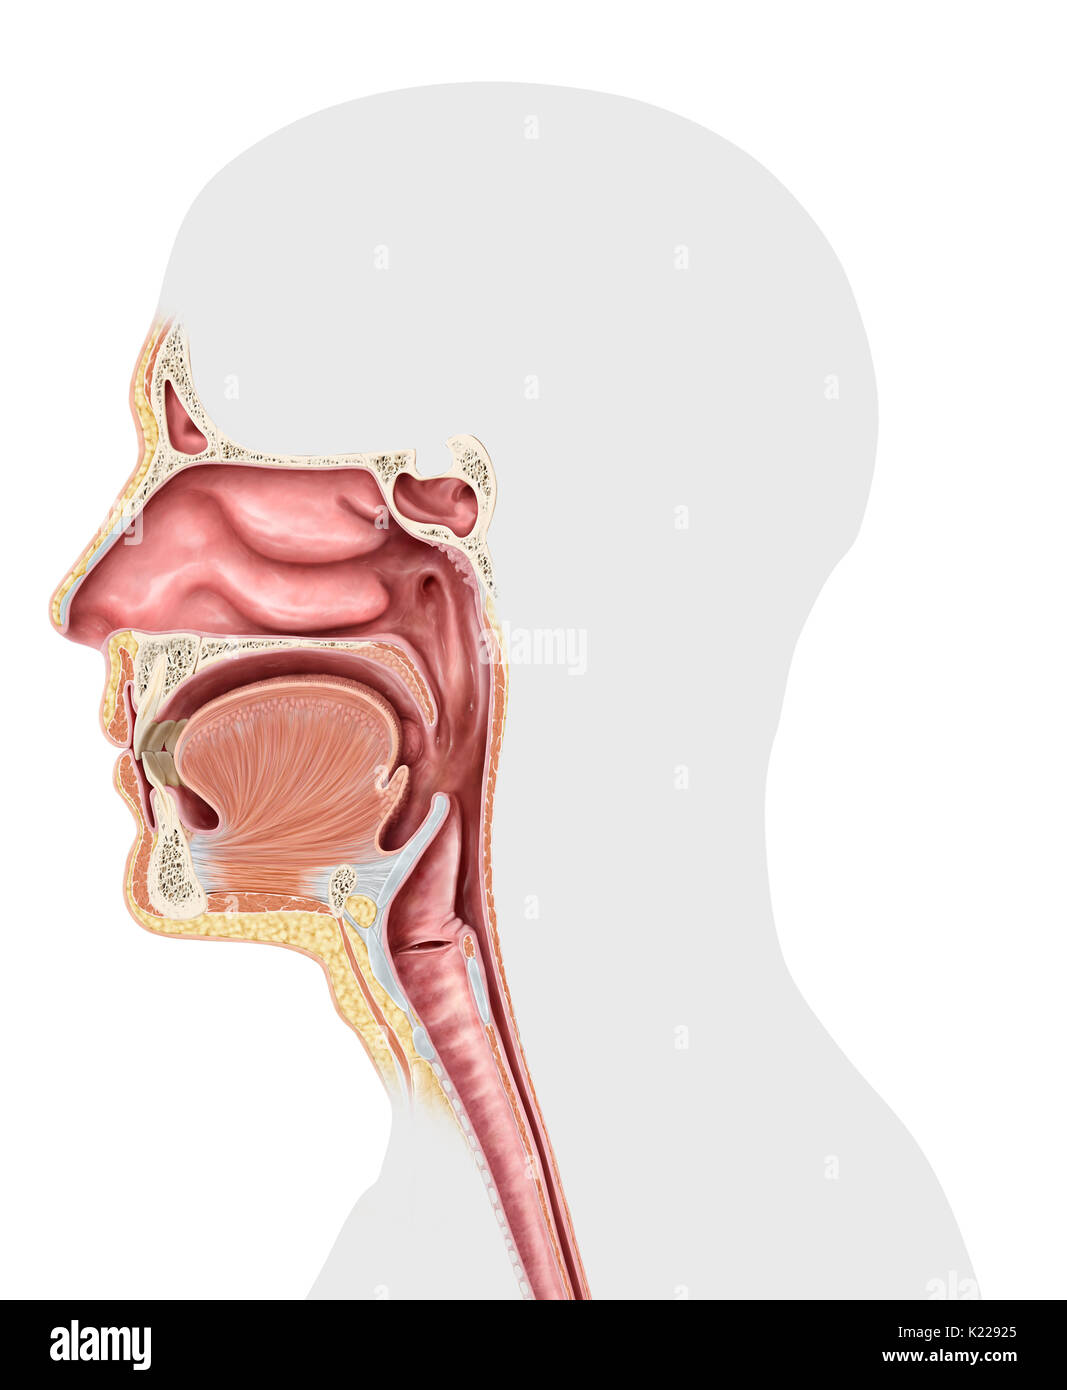 Blank Upper Respiratory System Diagram